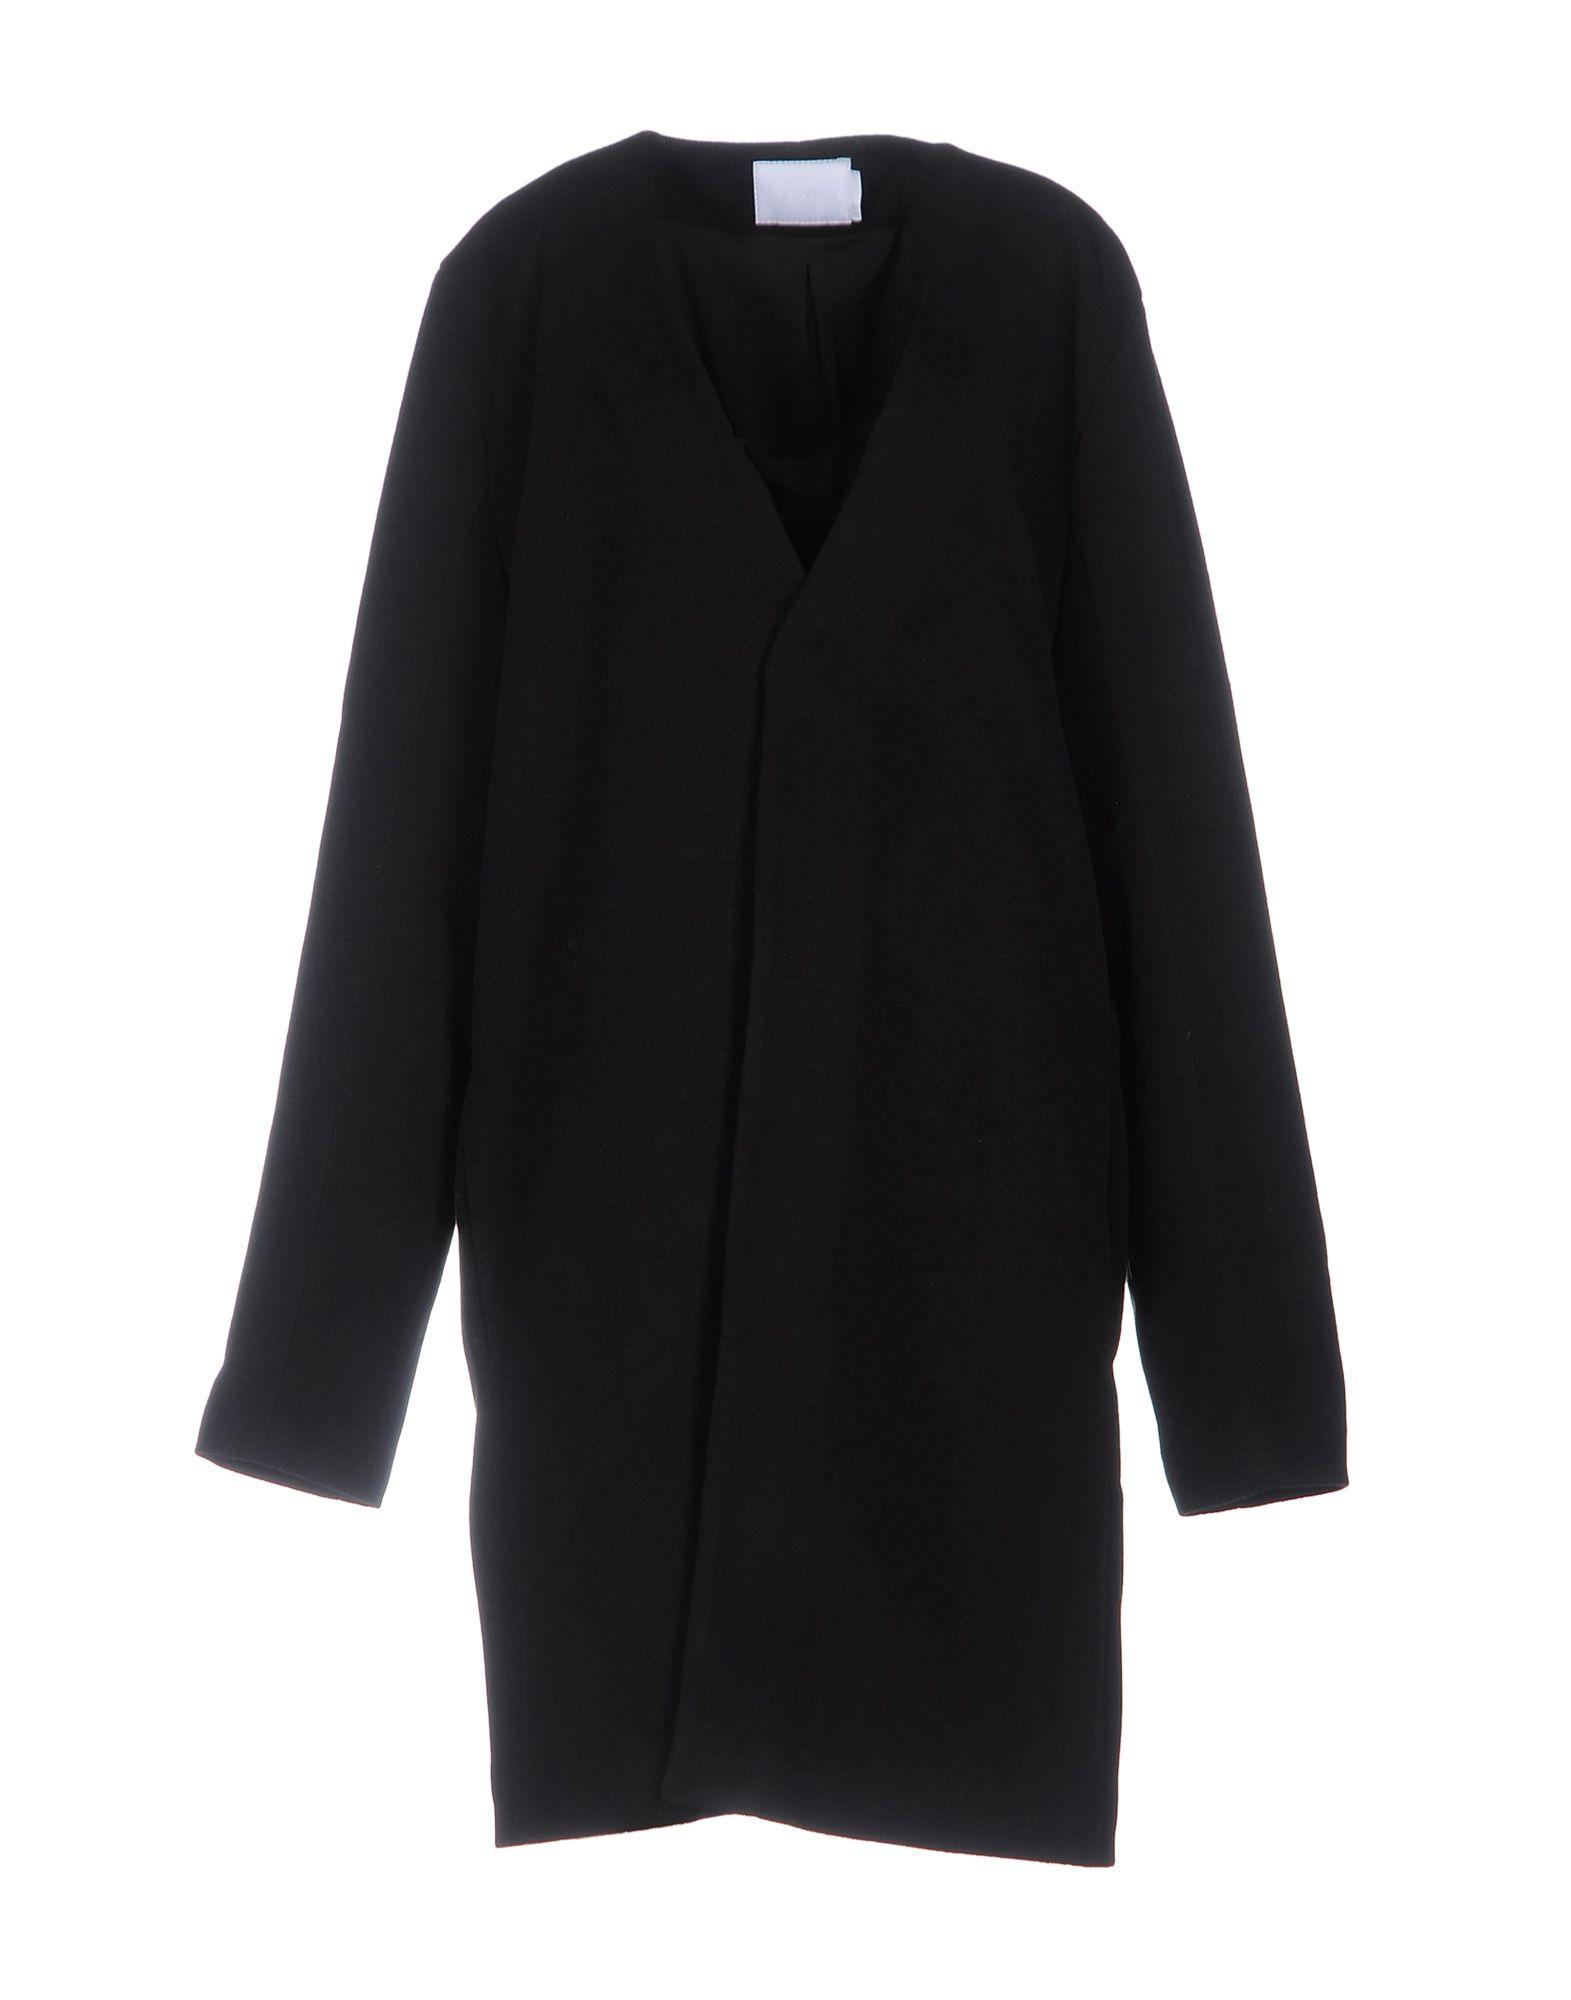 ADYN Full-Length Jacket, Black